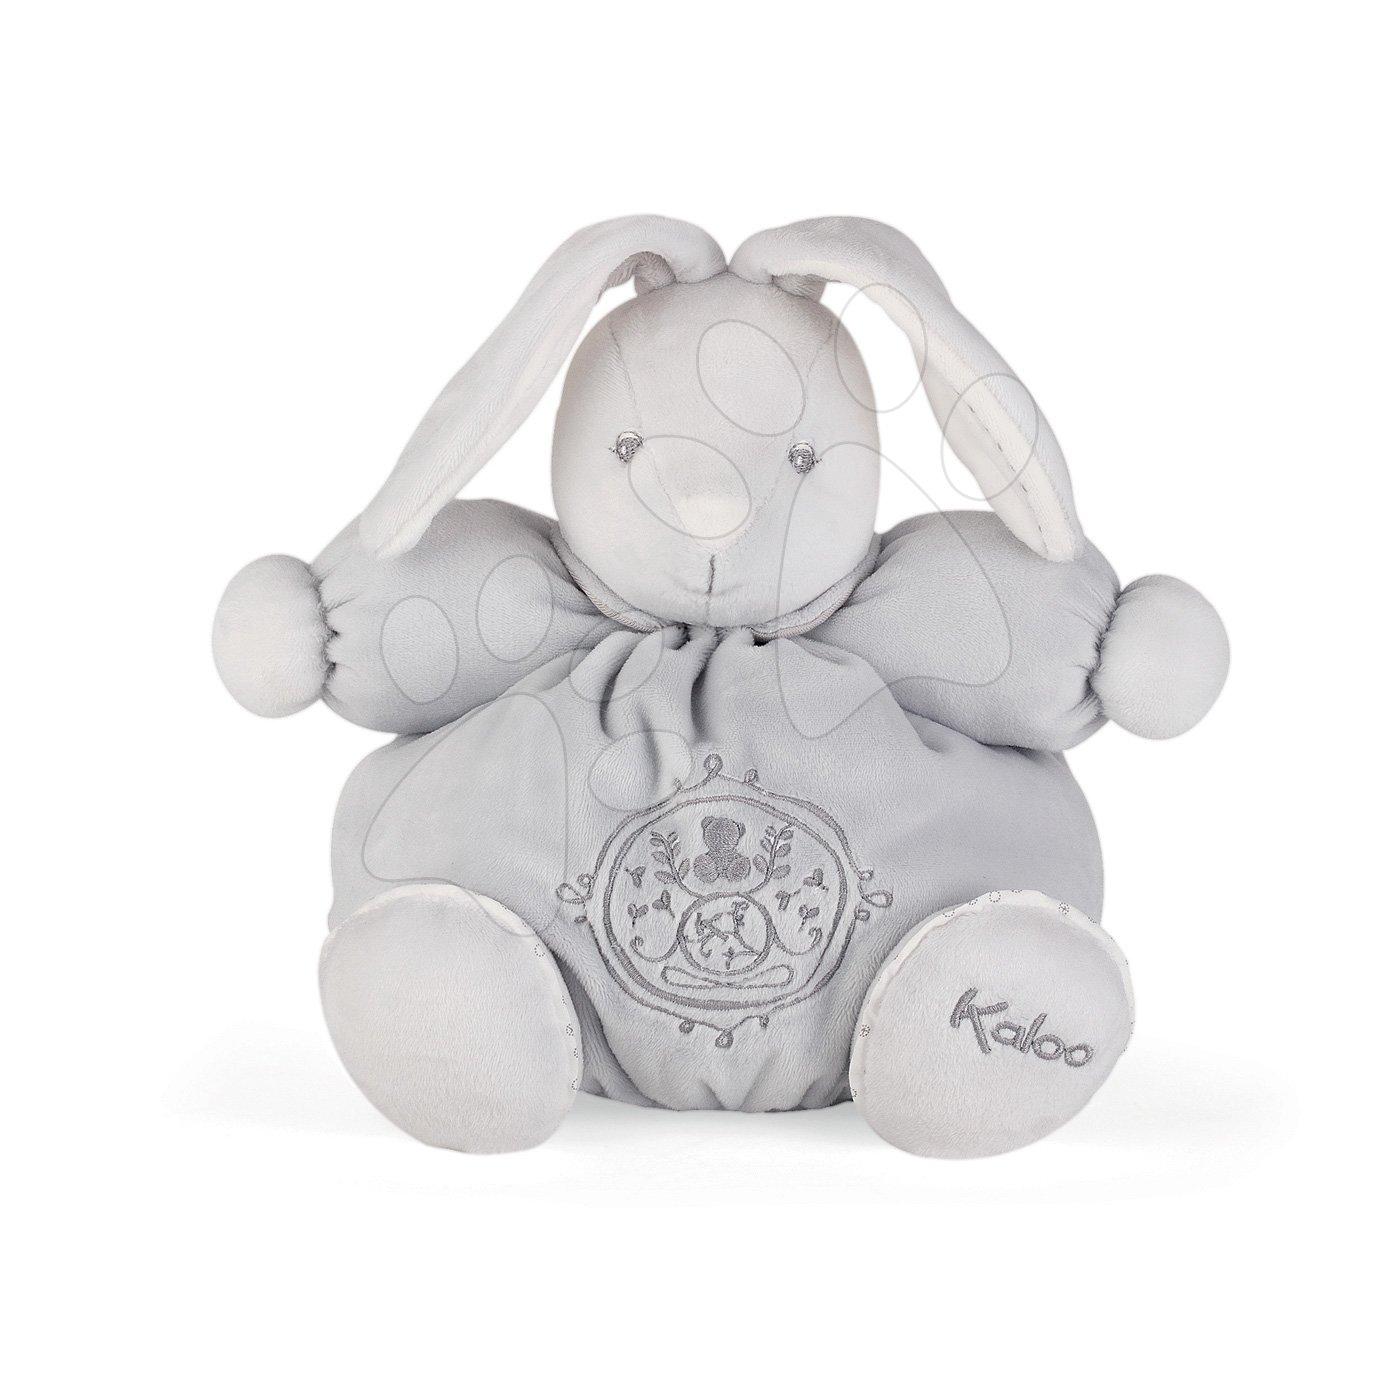 Kaloo plyšový zajačik Perle Chubby 25 cm 960220 šedý